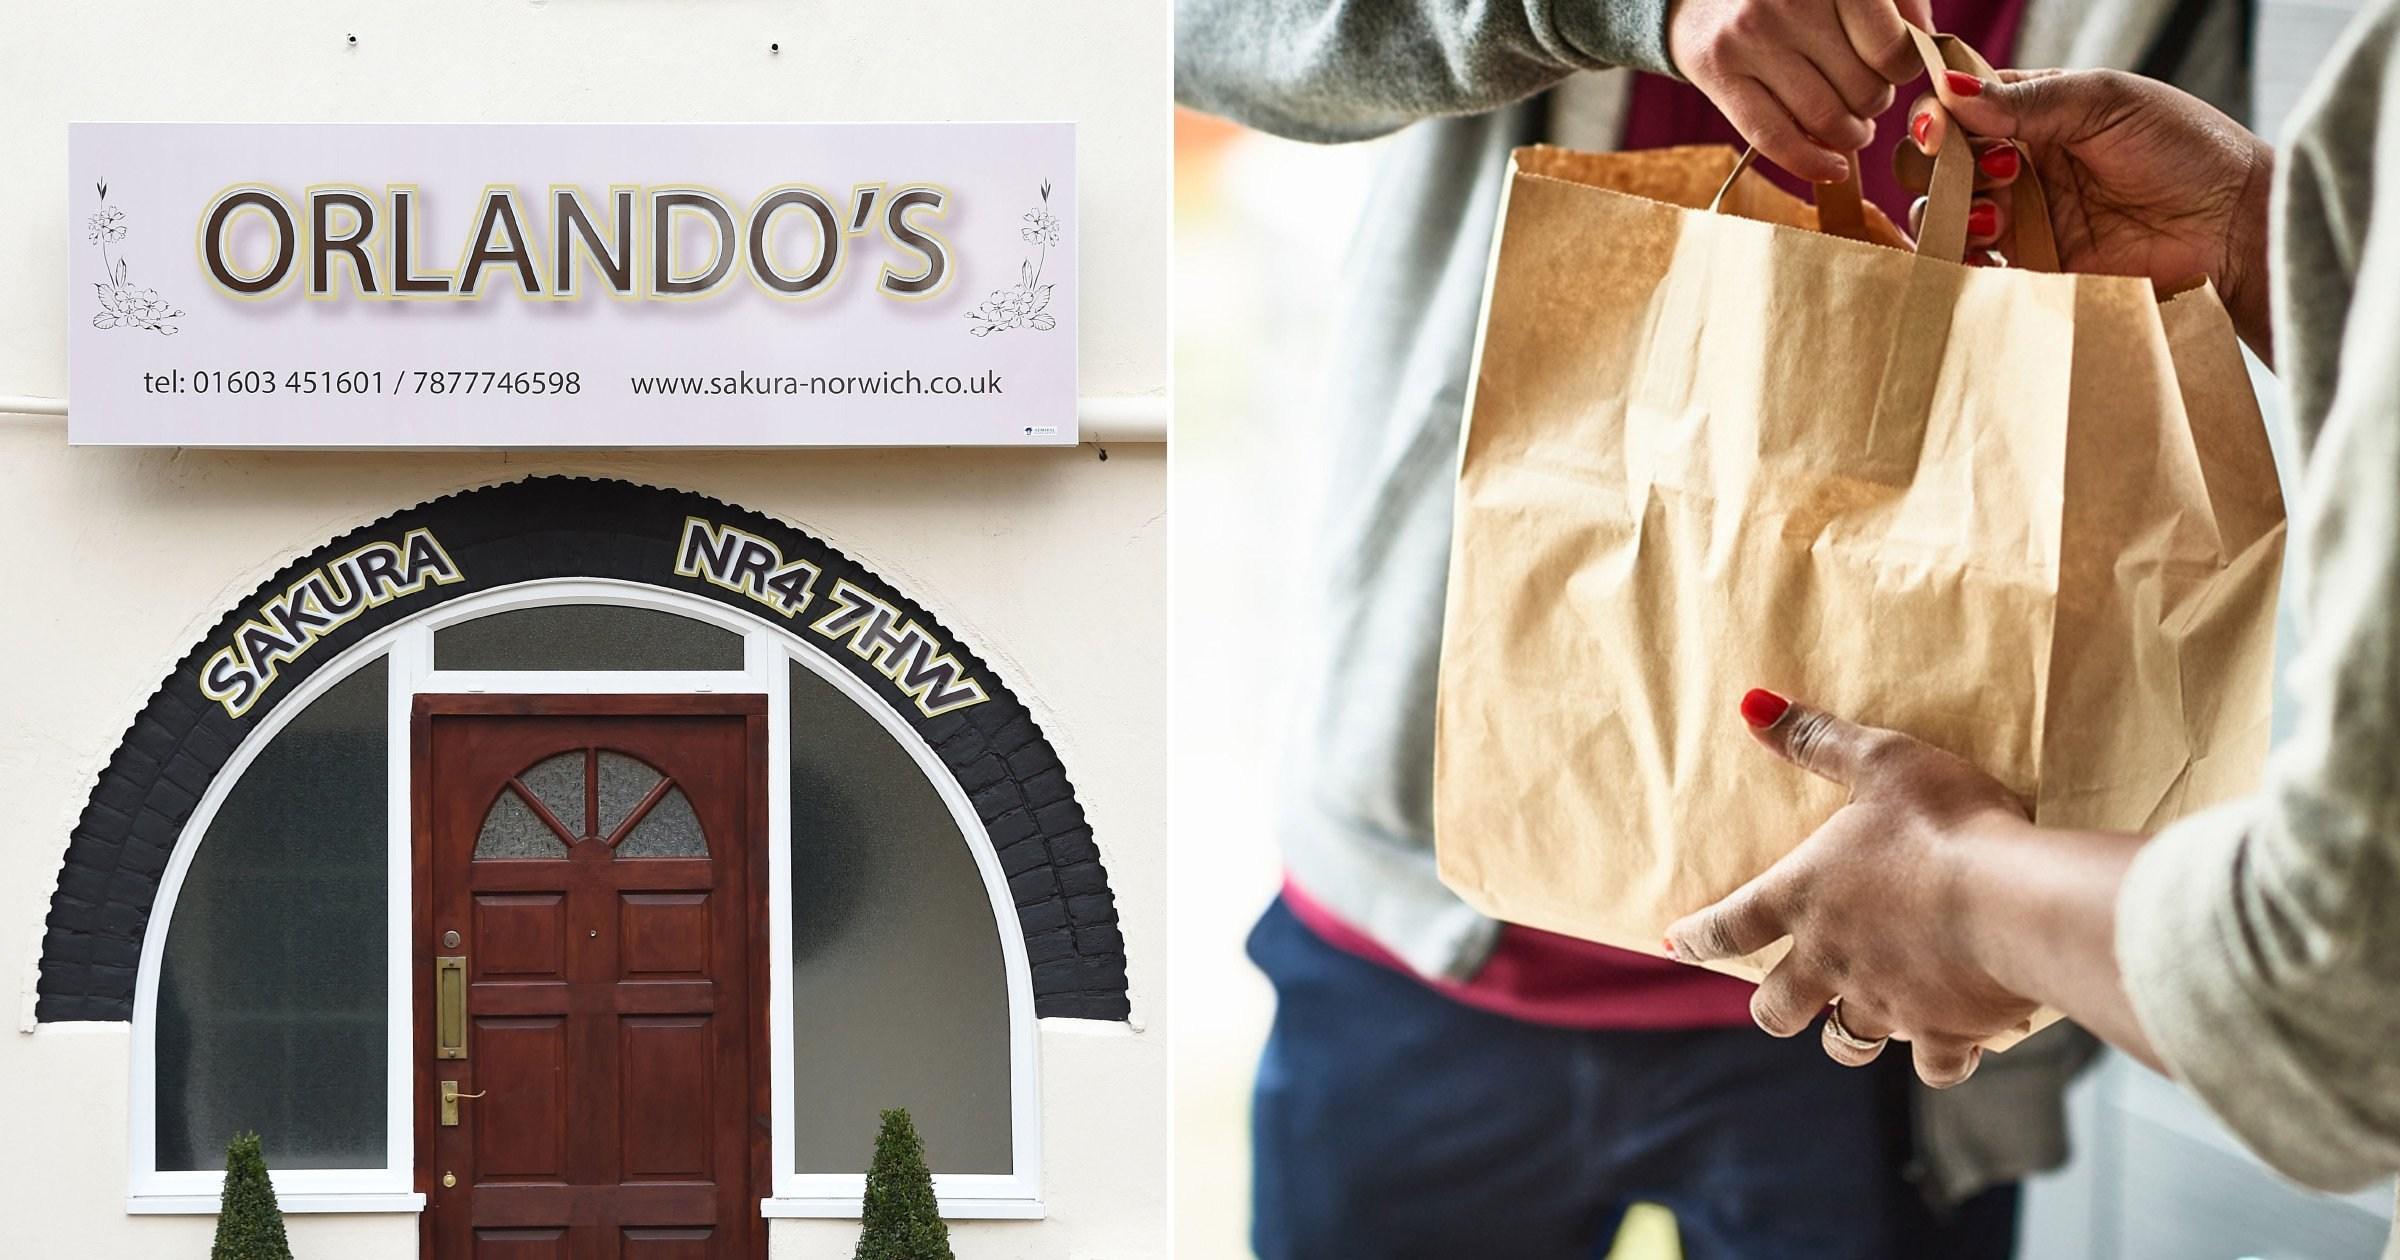 Man denies 'running restaurant' from home despite sign above front door